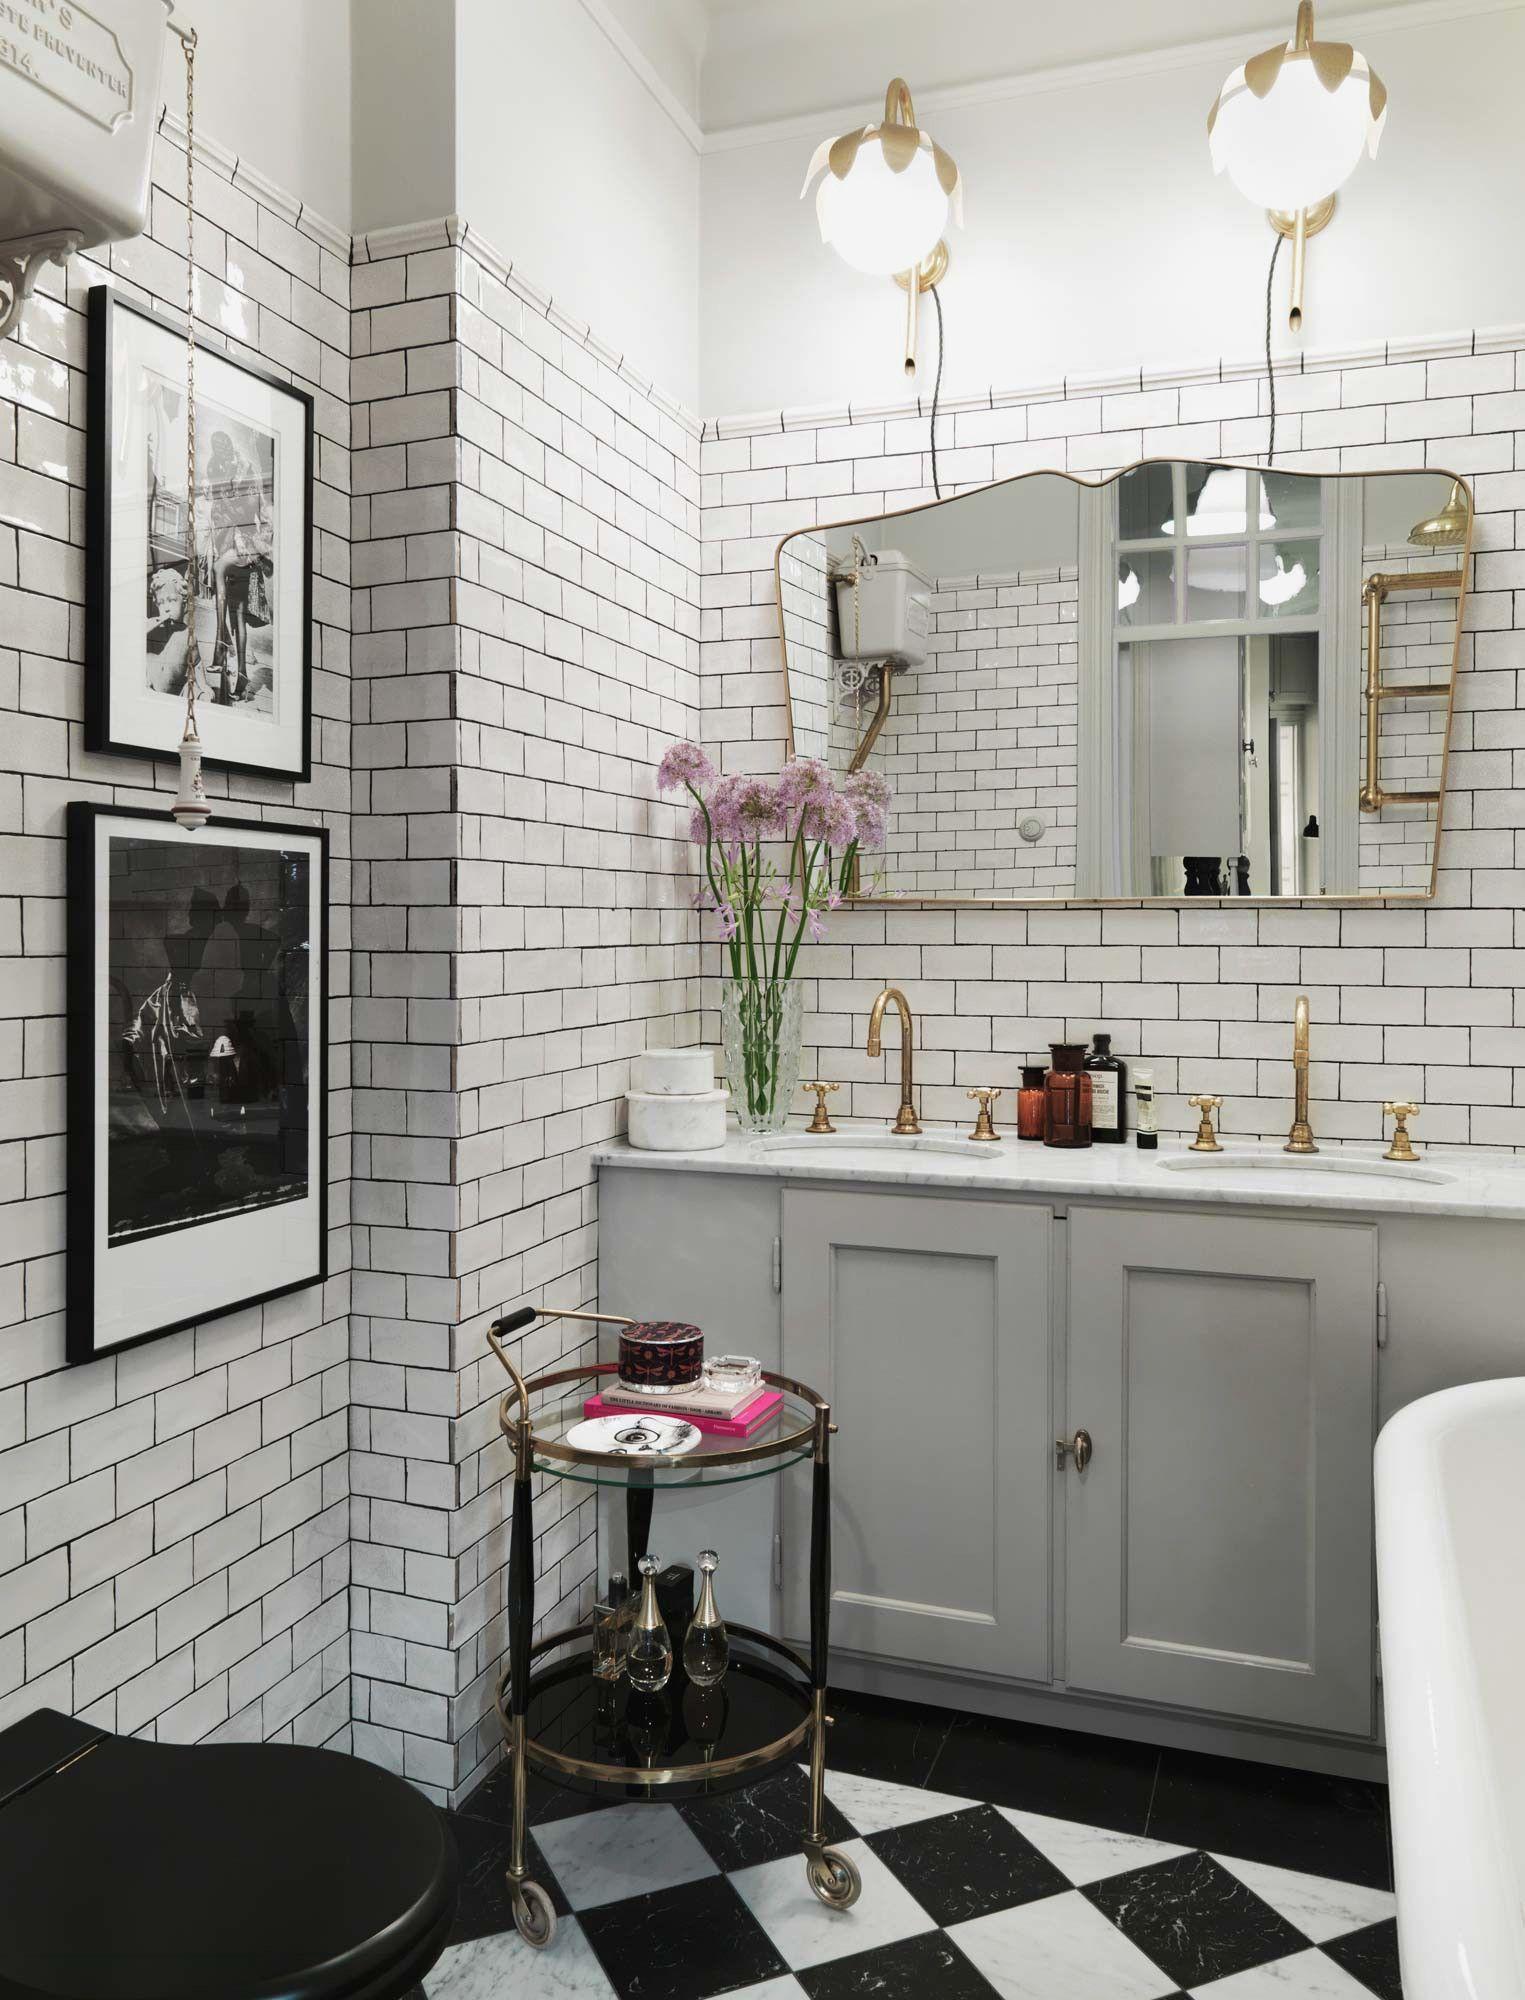 Bathroom Awesome Art Deco Bathroom Lighting Decor Idea Stunning Wonderful On Home Design Art Deco Bathr Badrumsinspiration Vackra Badrum Ideer For Heminredning